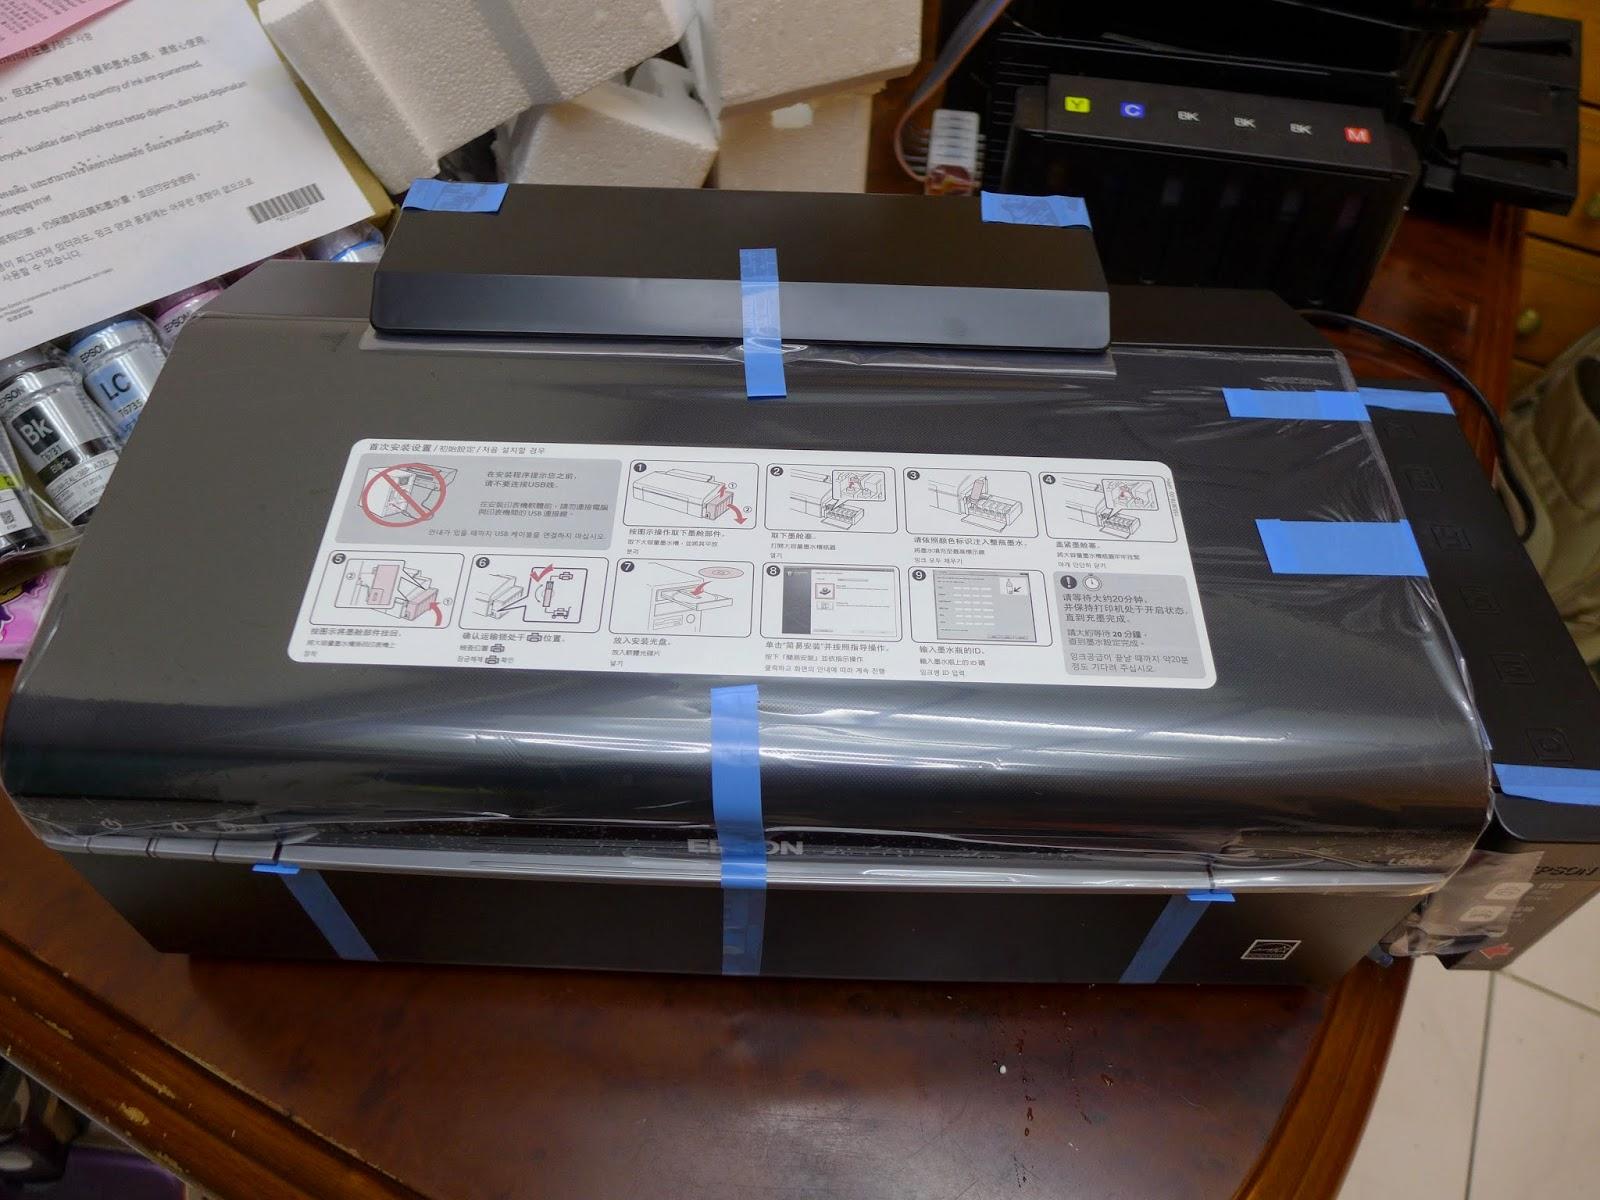 Process to reset the printer Epson L800 | en Rellenado